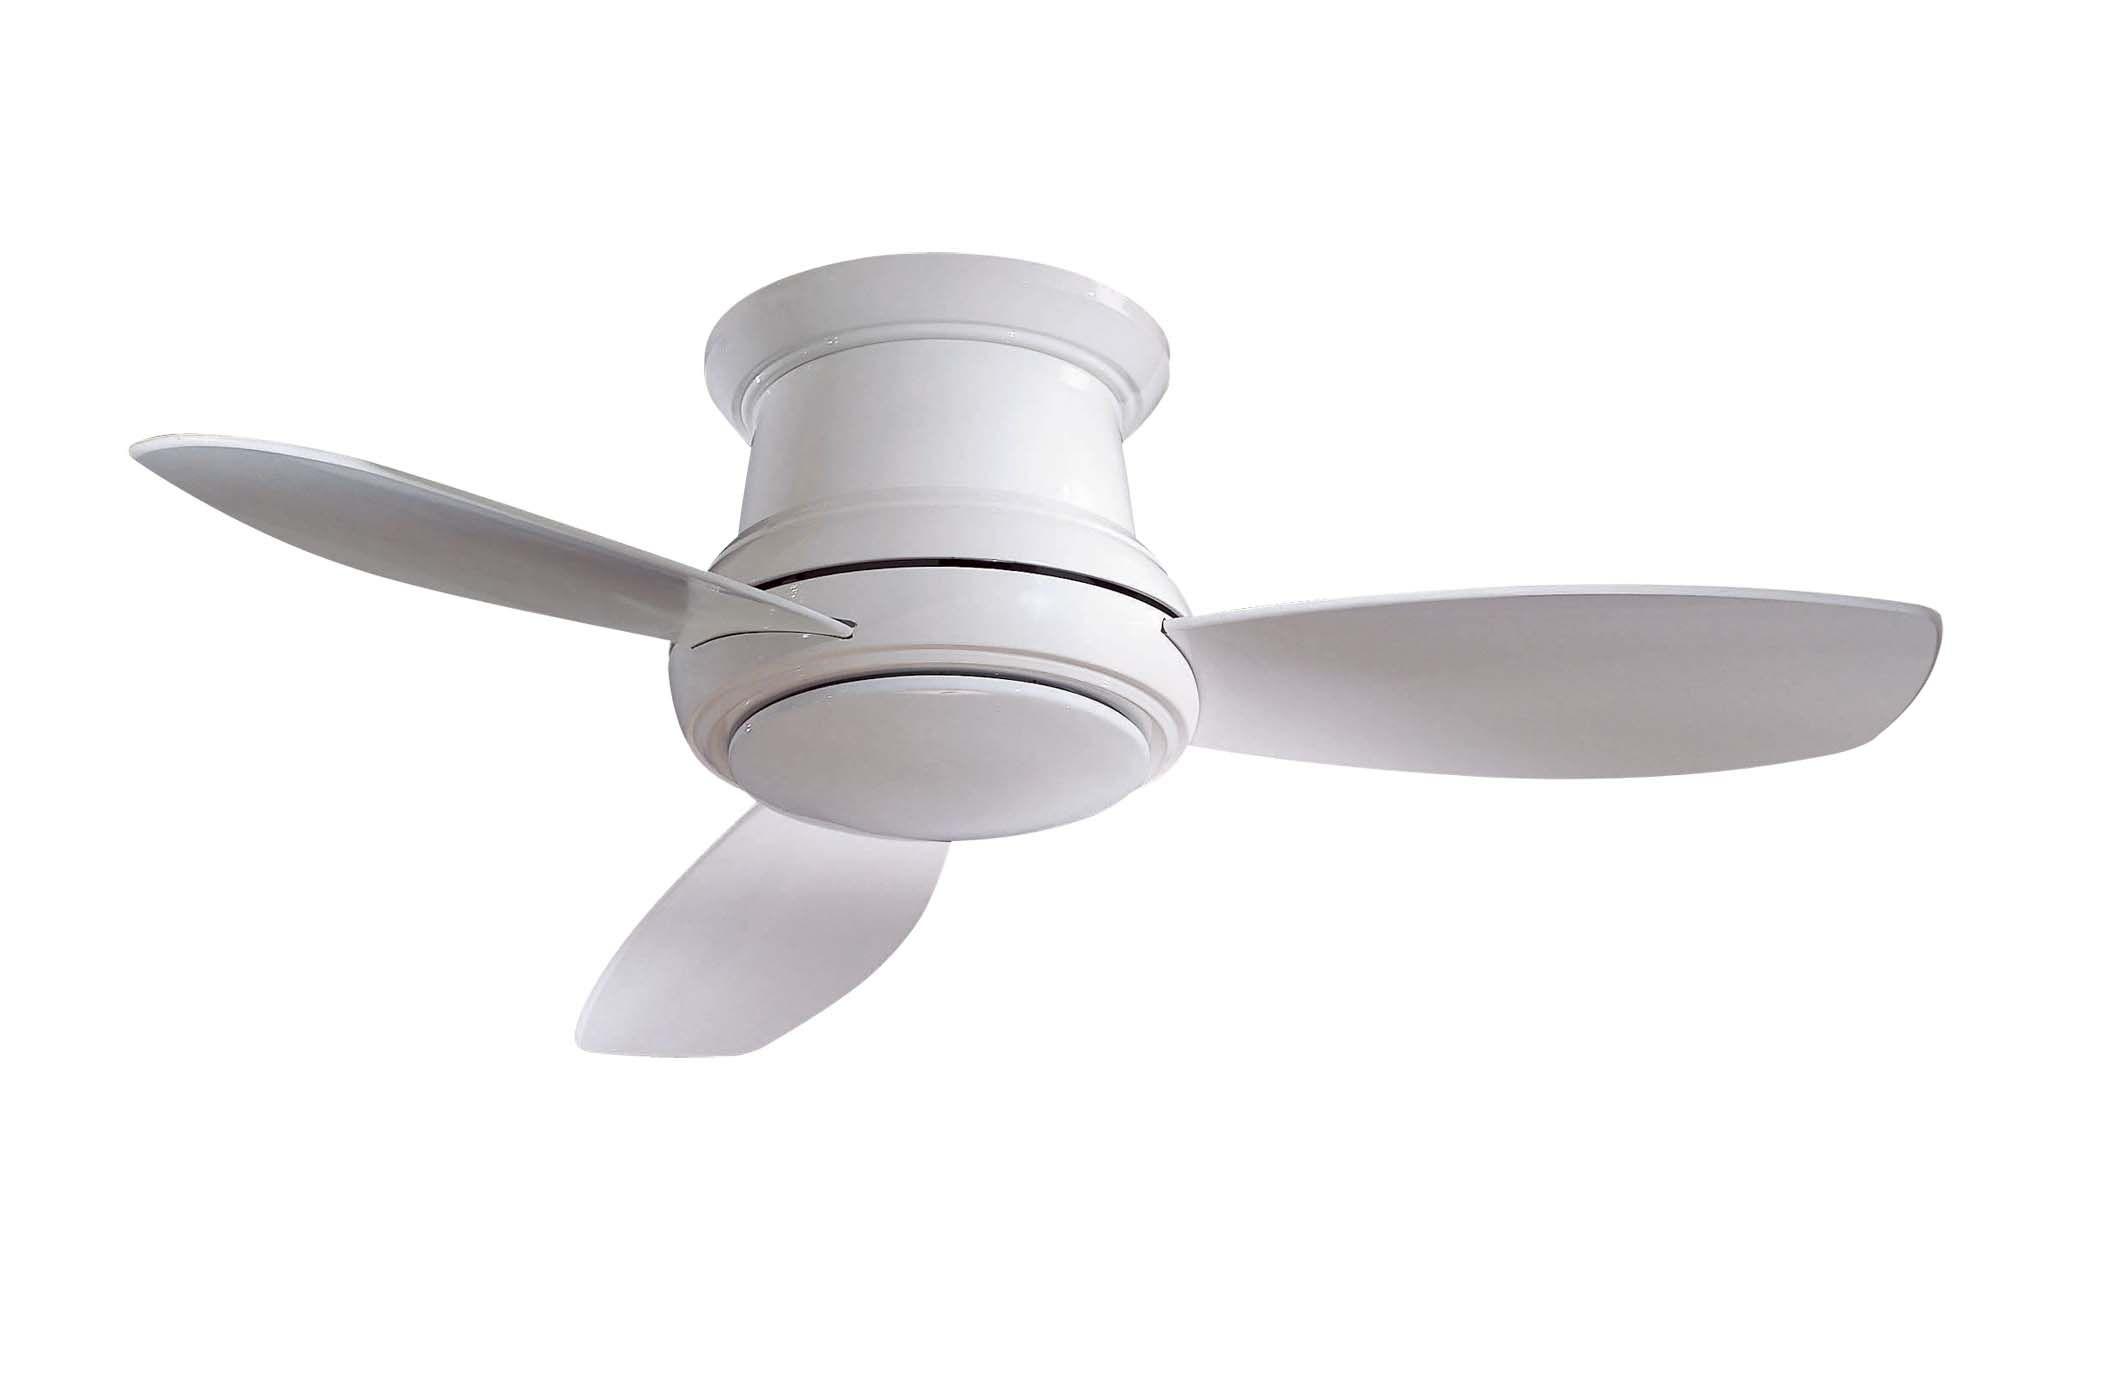 Concept Ii Ceiling Fan With Light By Minka Aire F518l Bn Ceiling Fan Led Ceiling Fan Ceiling Fan With Light